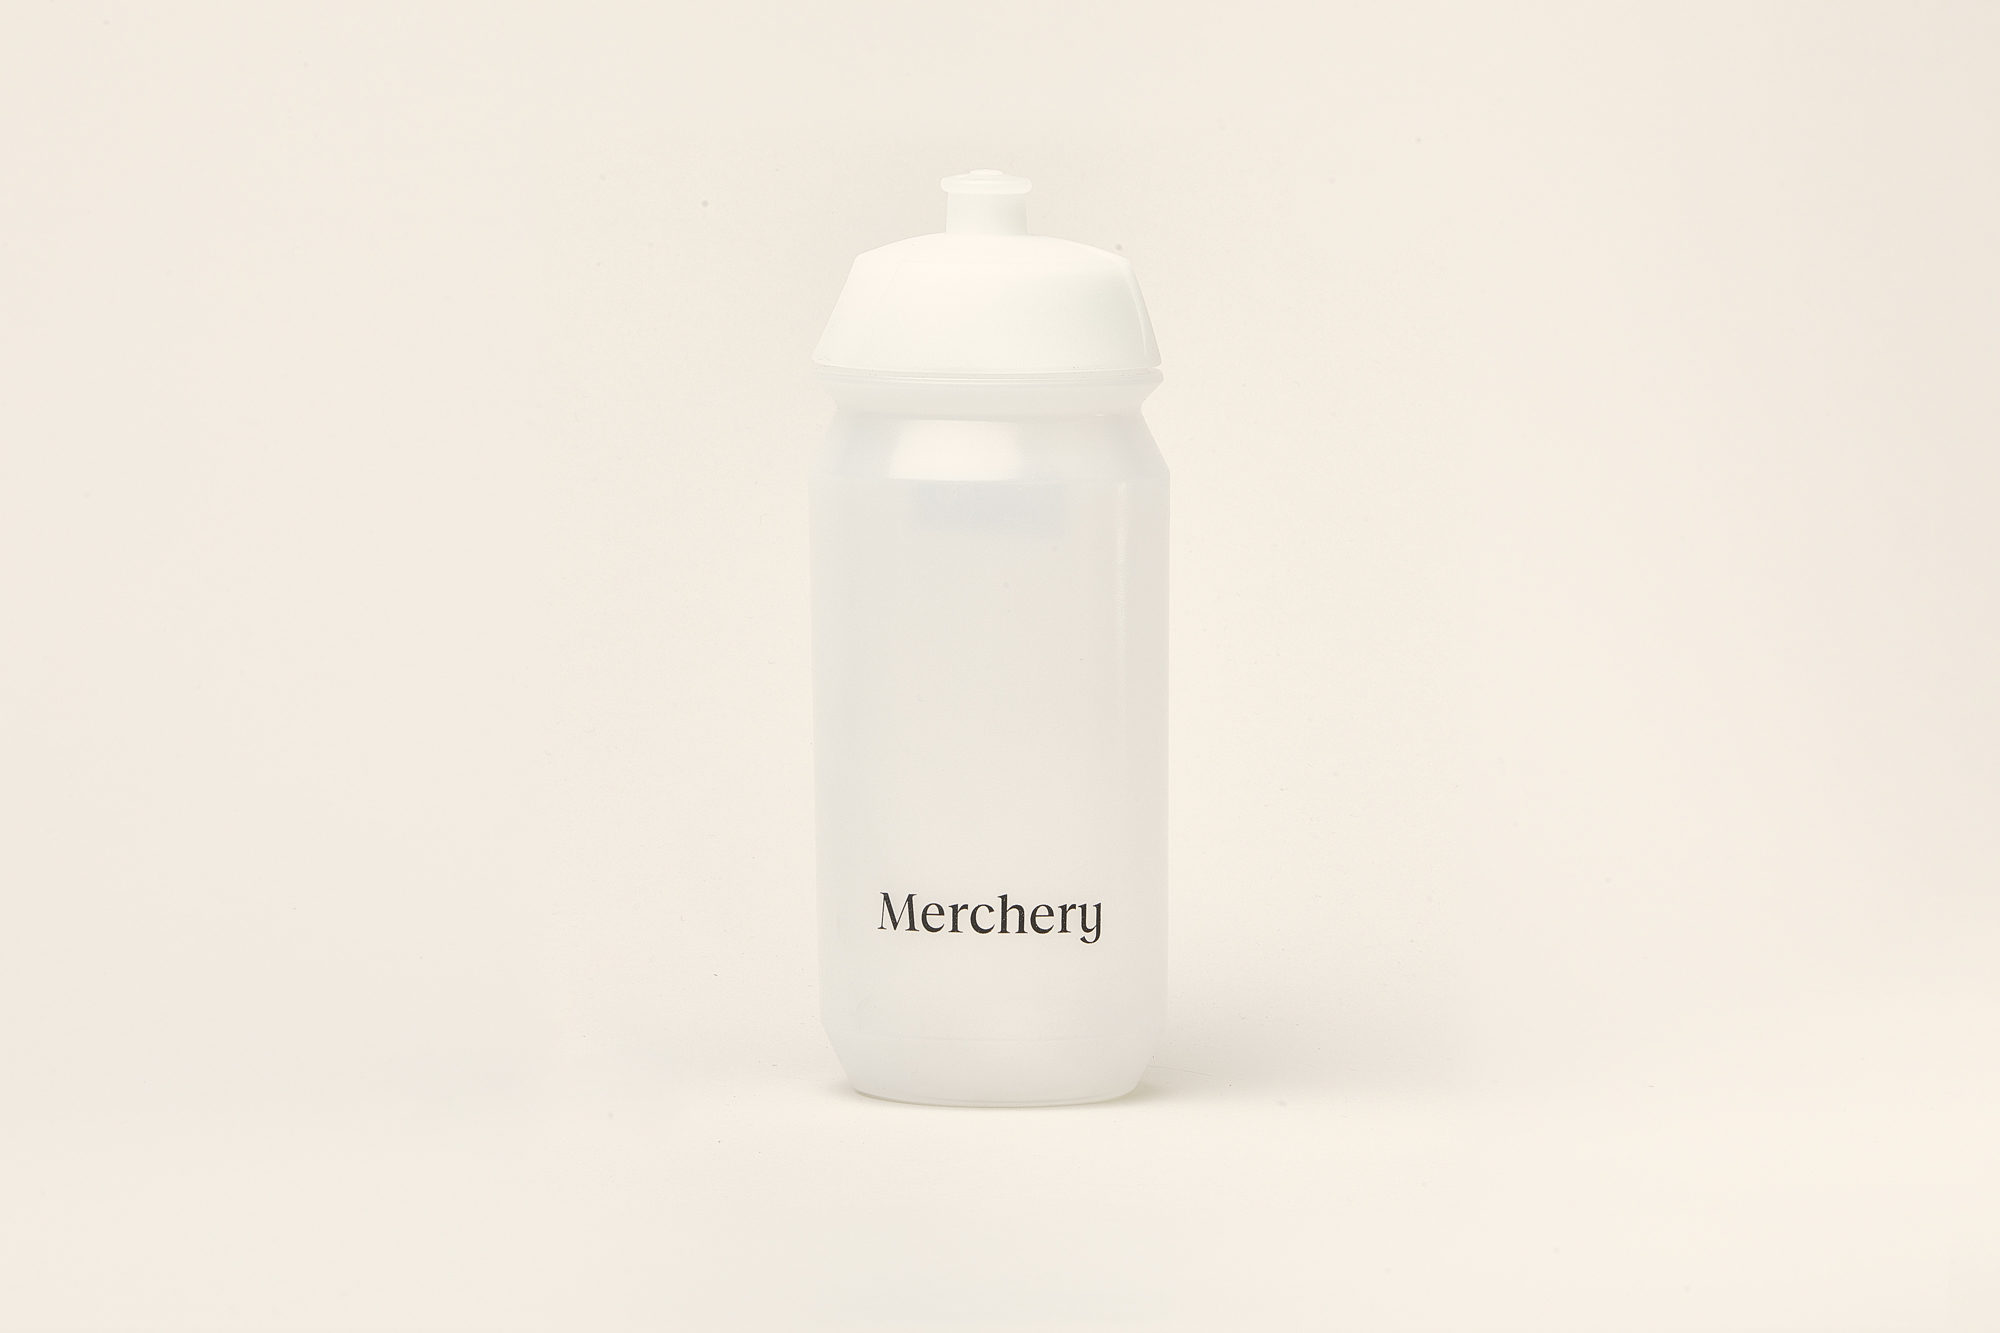 Merchery customized cycling bio bottle white eco friendly branded bottle